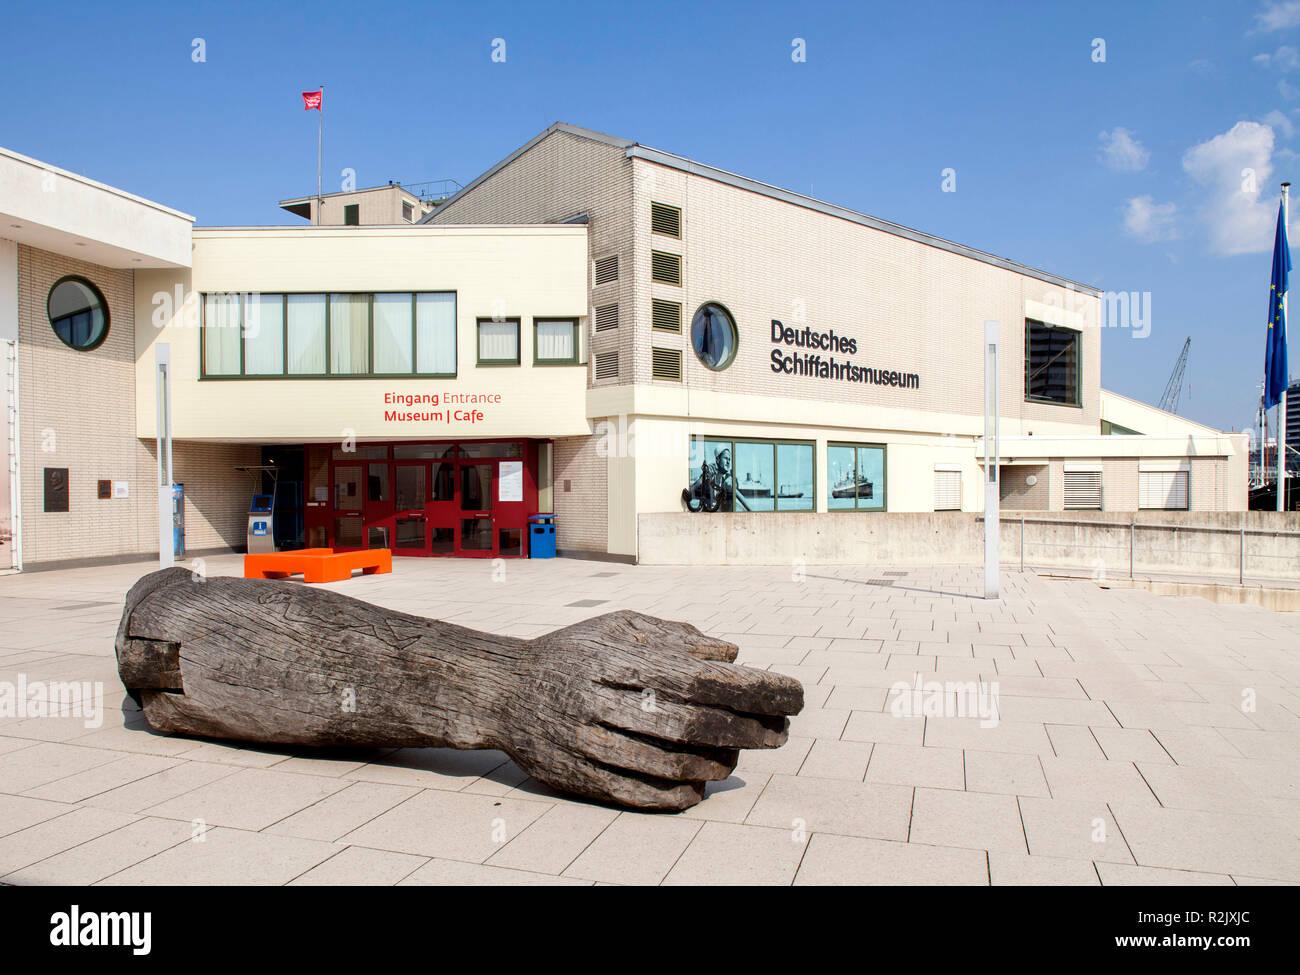 German Maritime Museum, Bremerhaven, Bremen, Germany, Europe Stock Photo